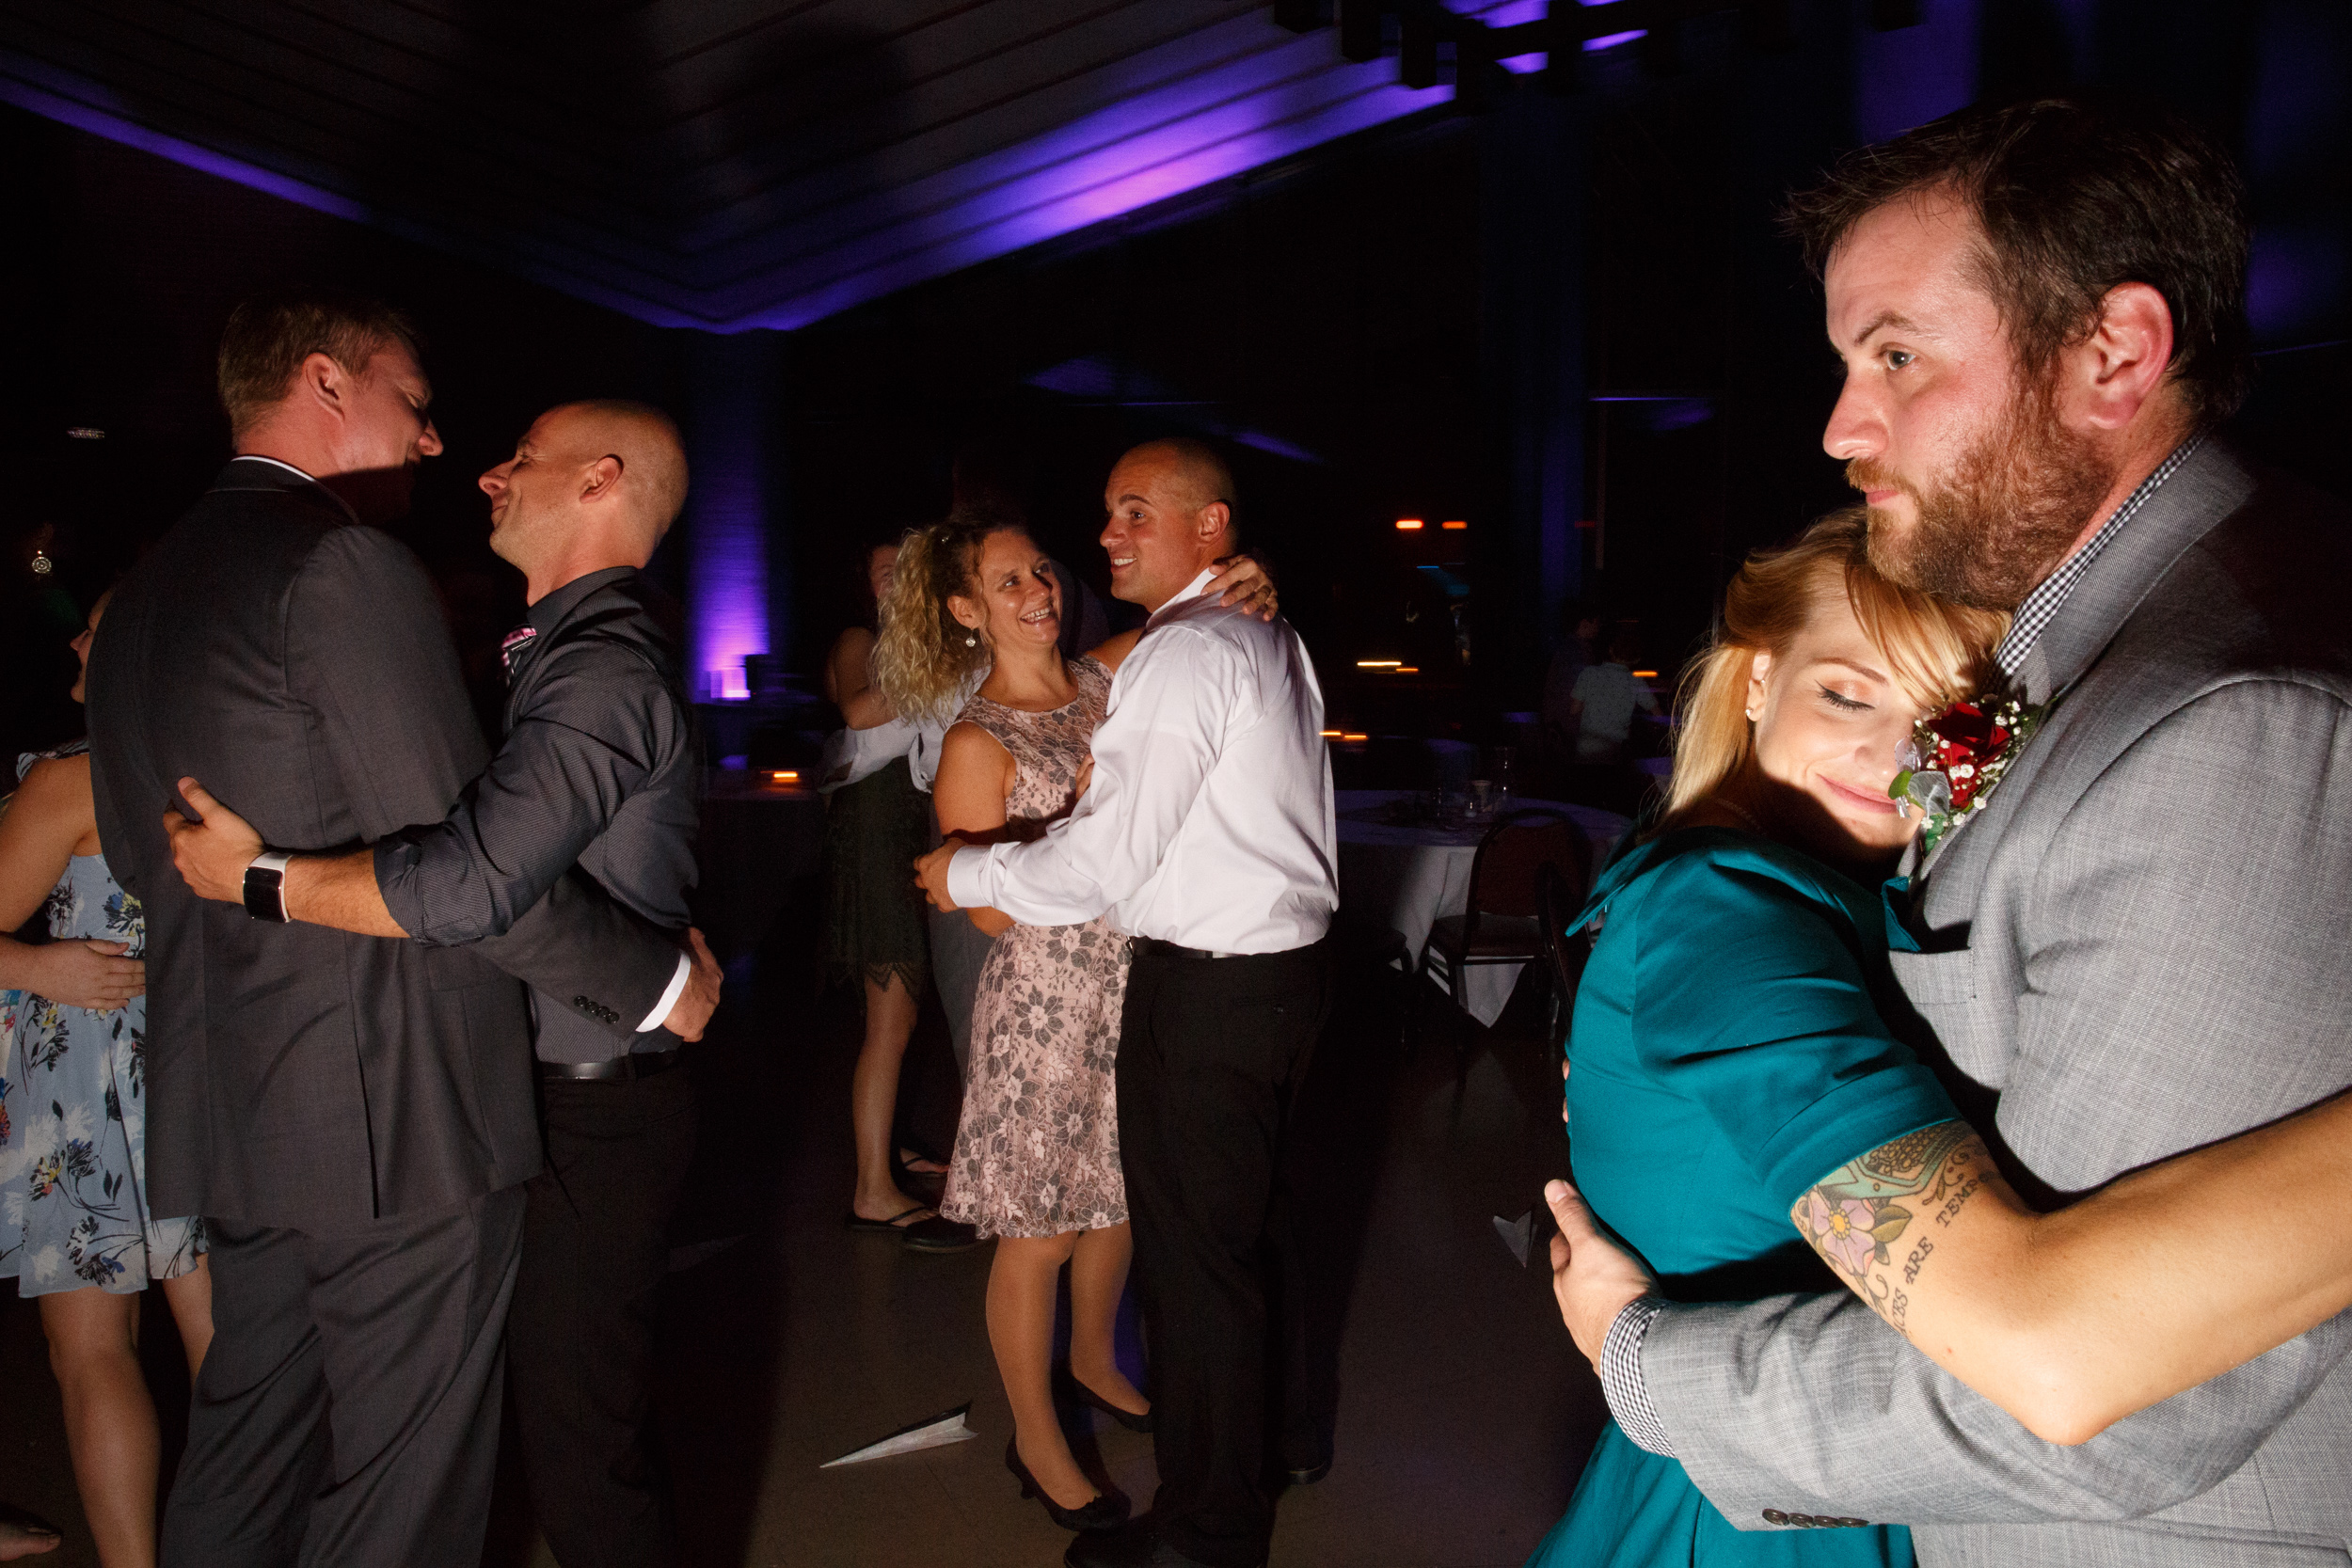 Christian & Sarah wedding photography by Brian milo-271.jpg